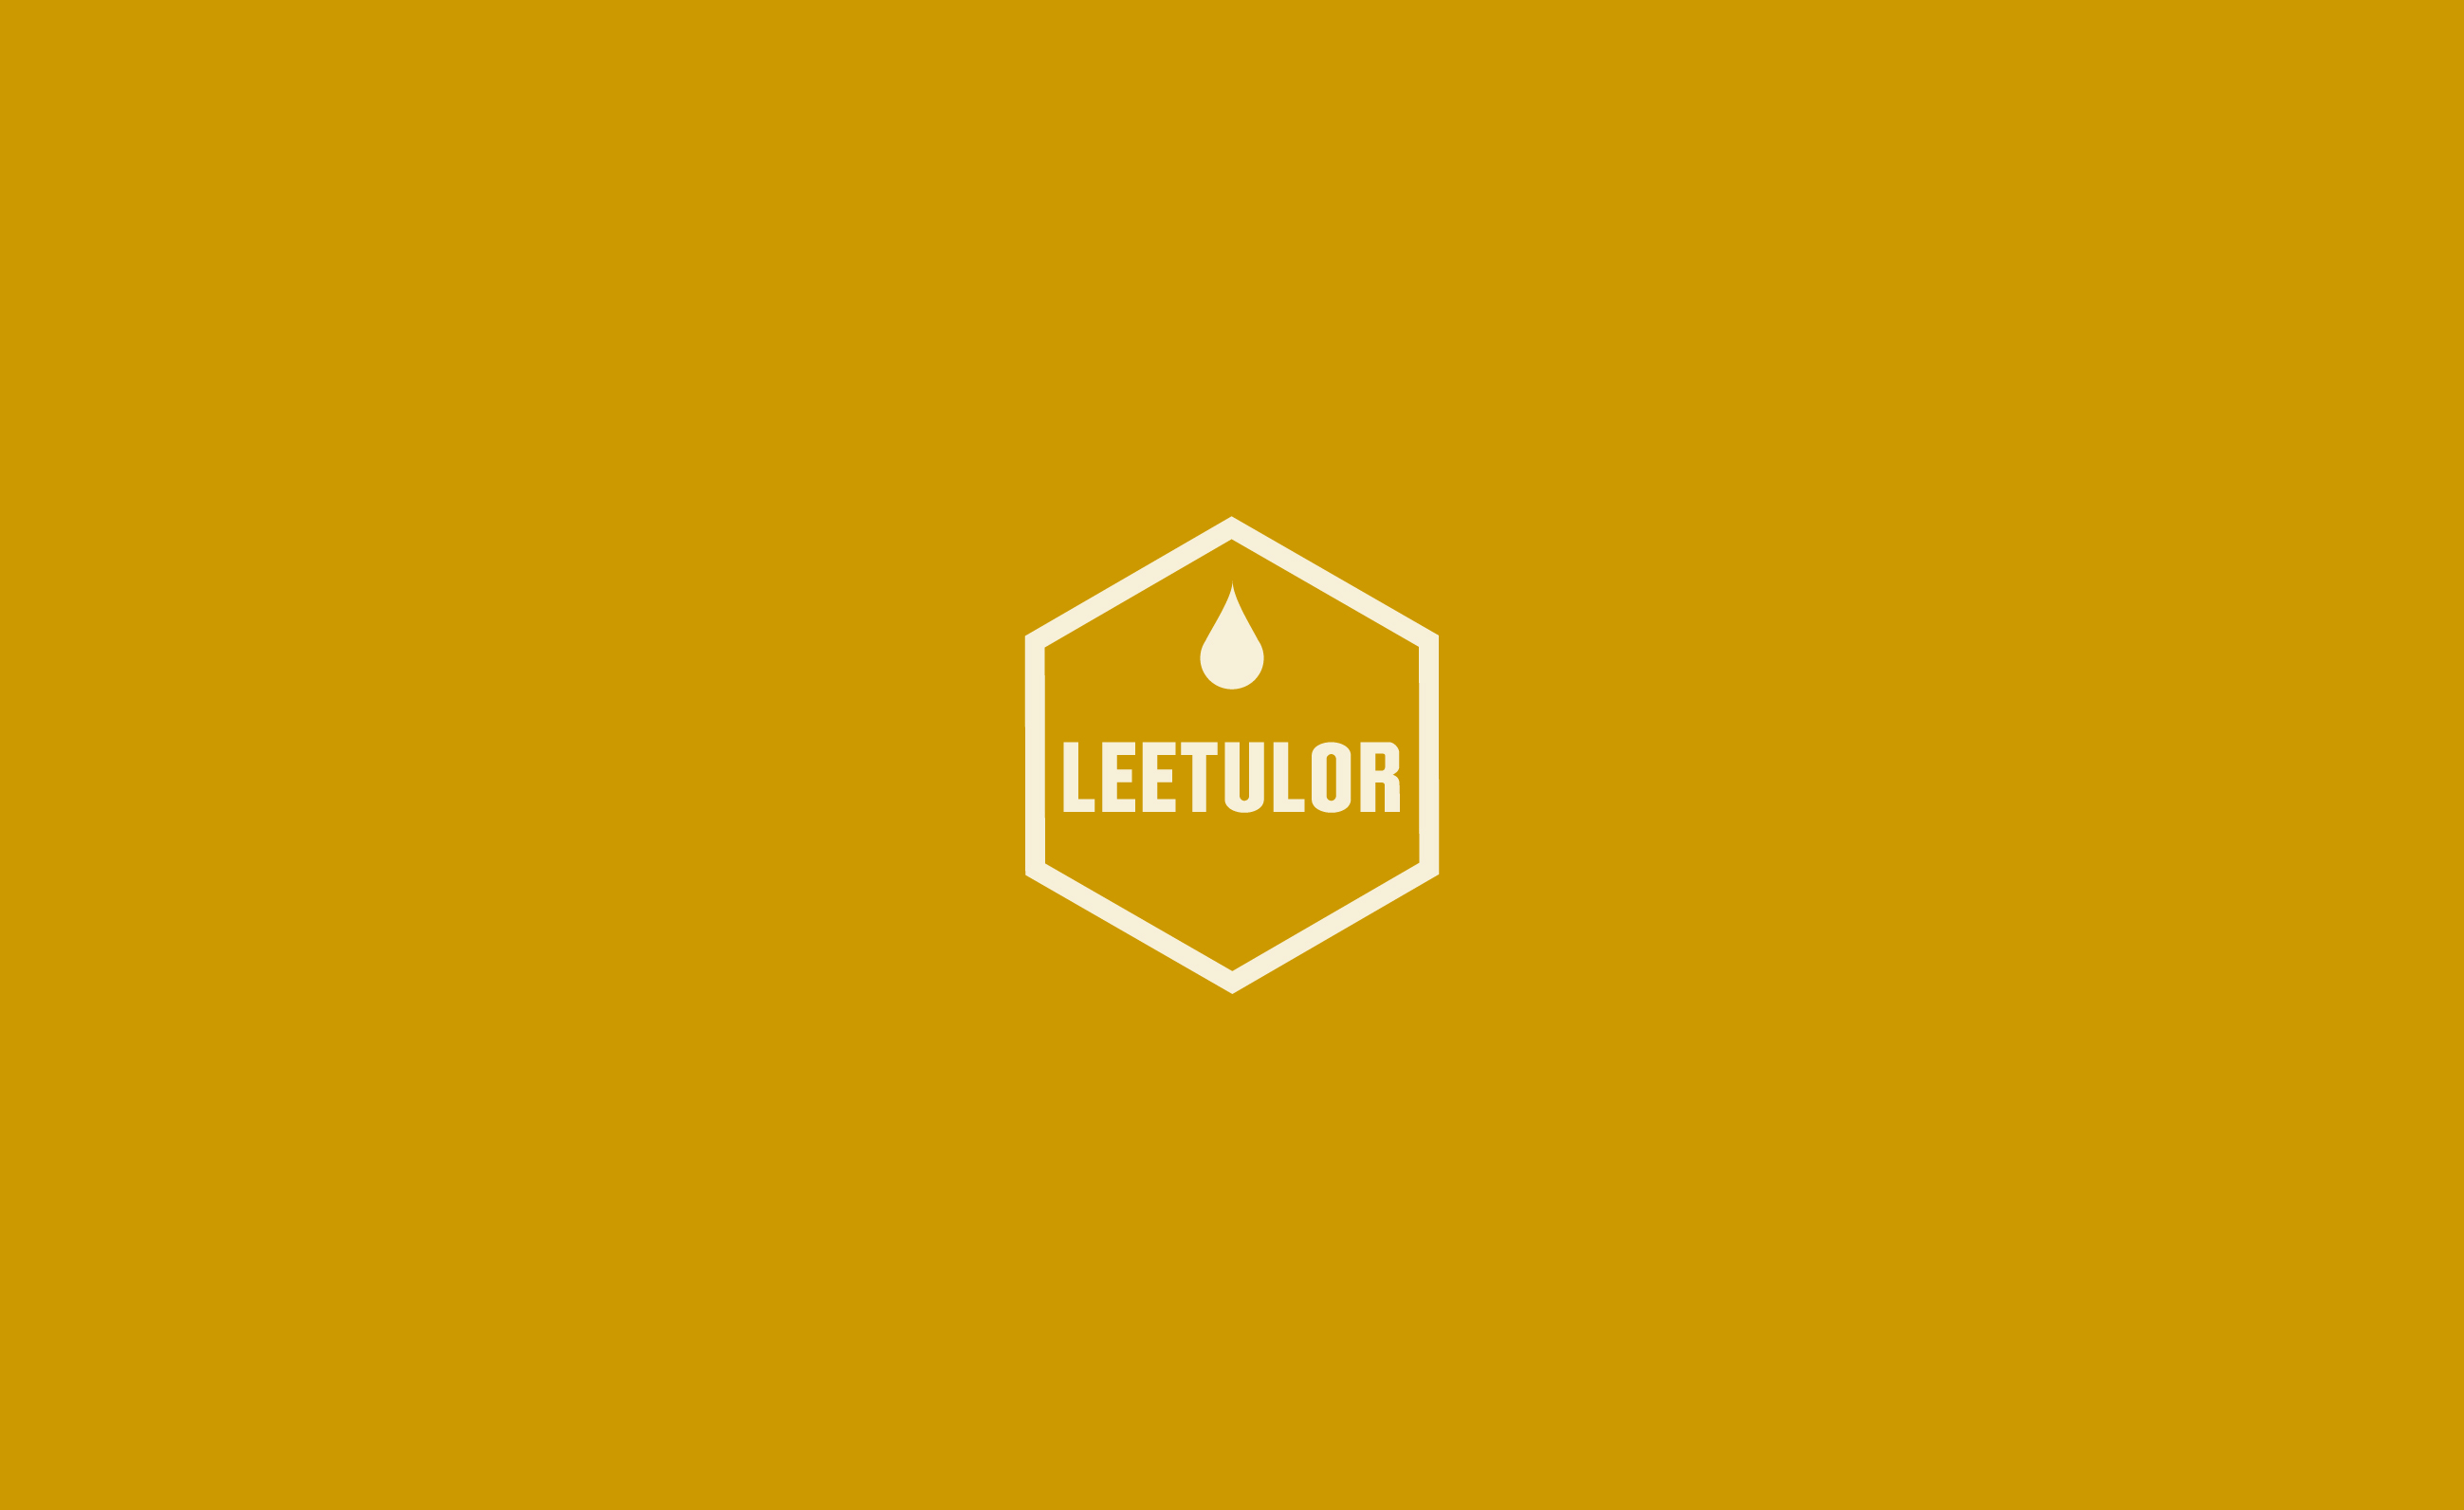 Leetulor_8